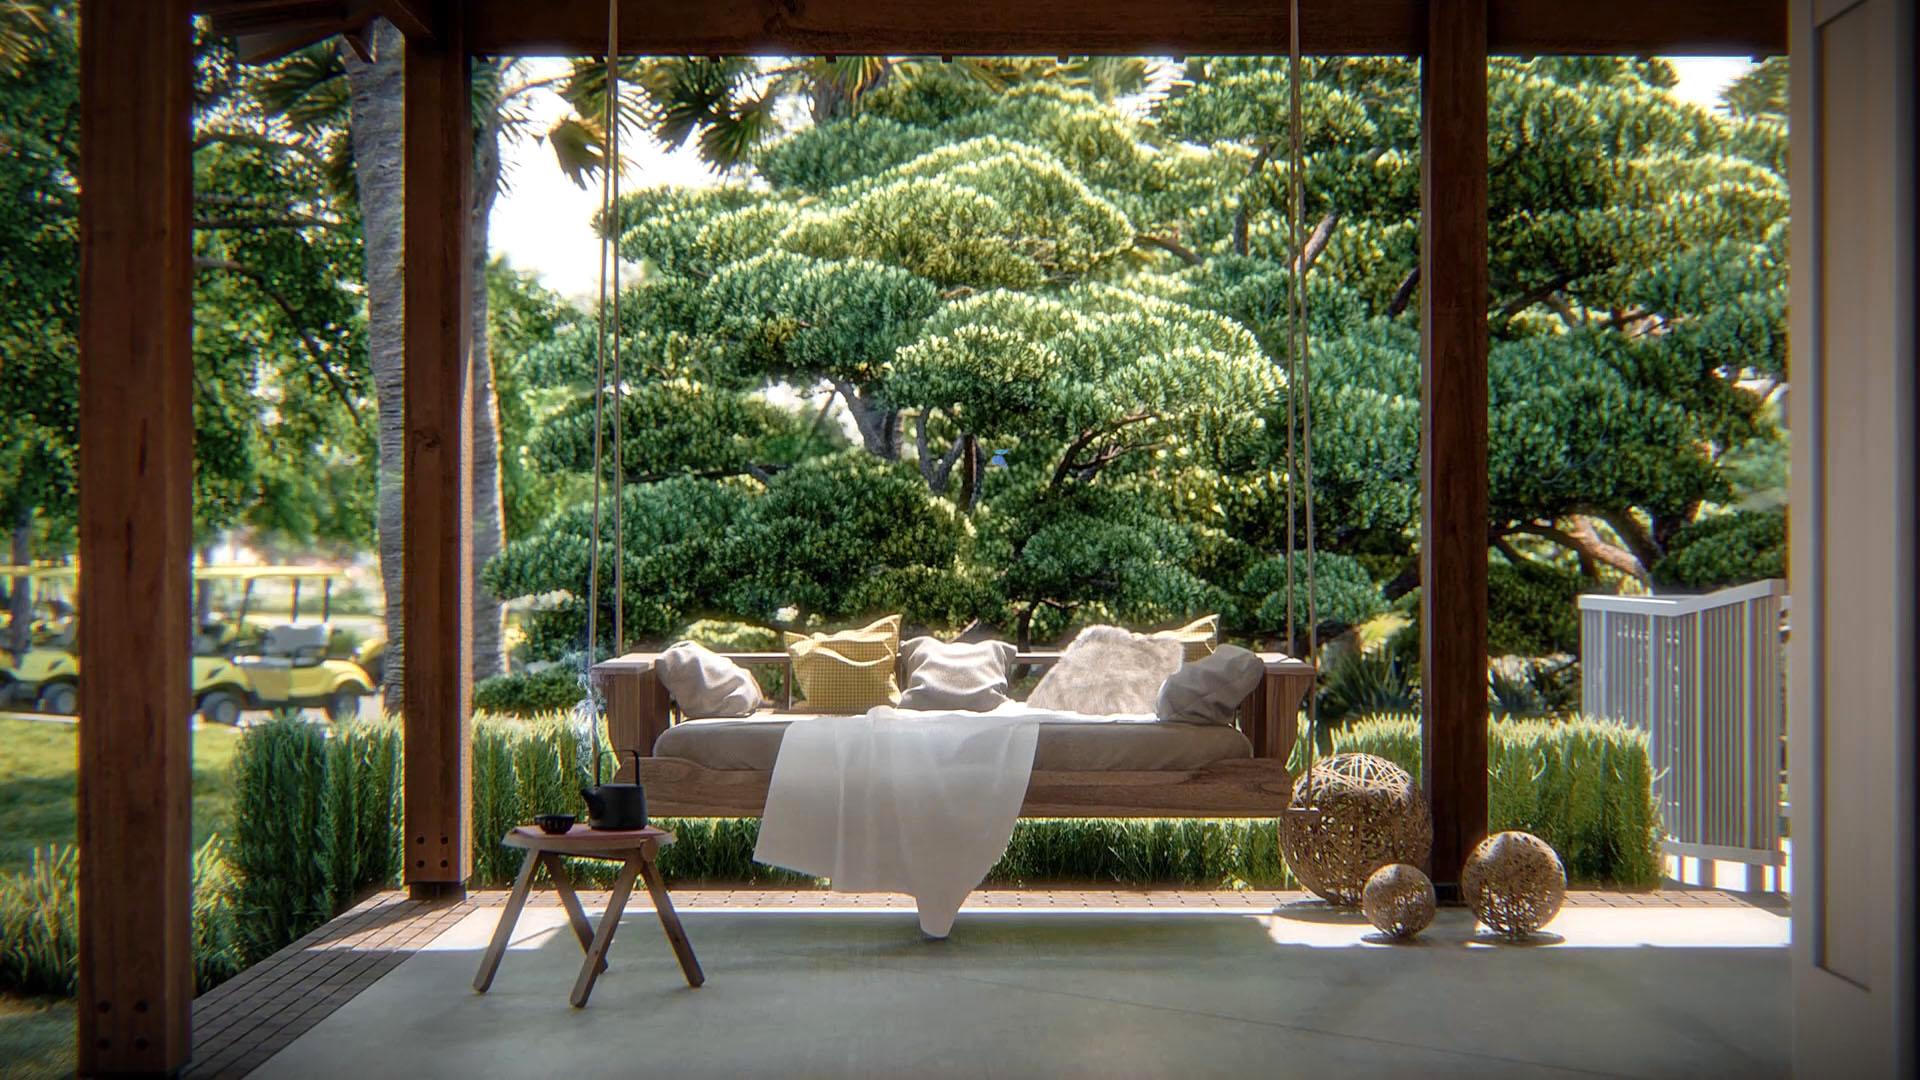 Porch swing at Carolina Pines, by TEN OVER MEDIA.